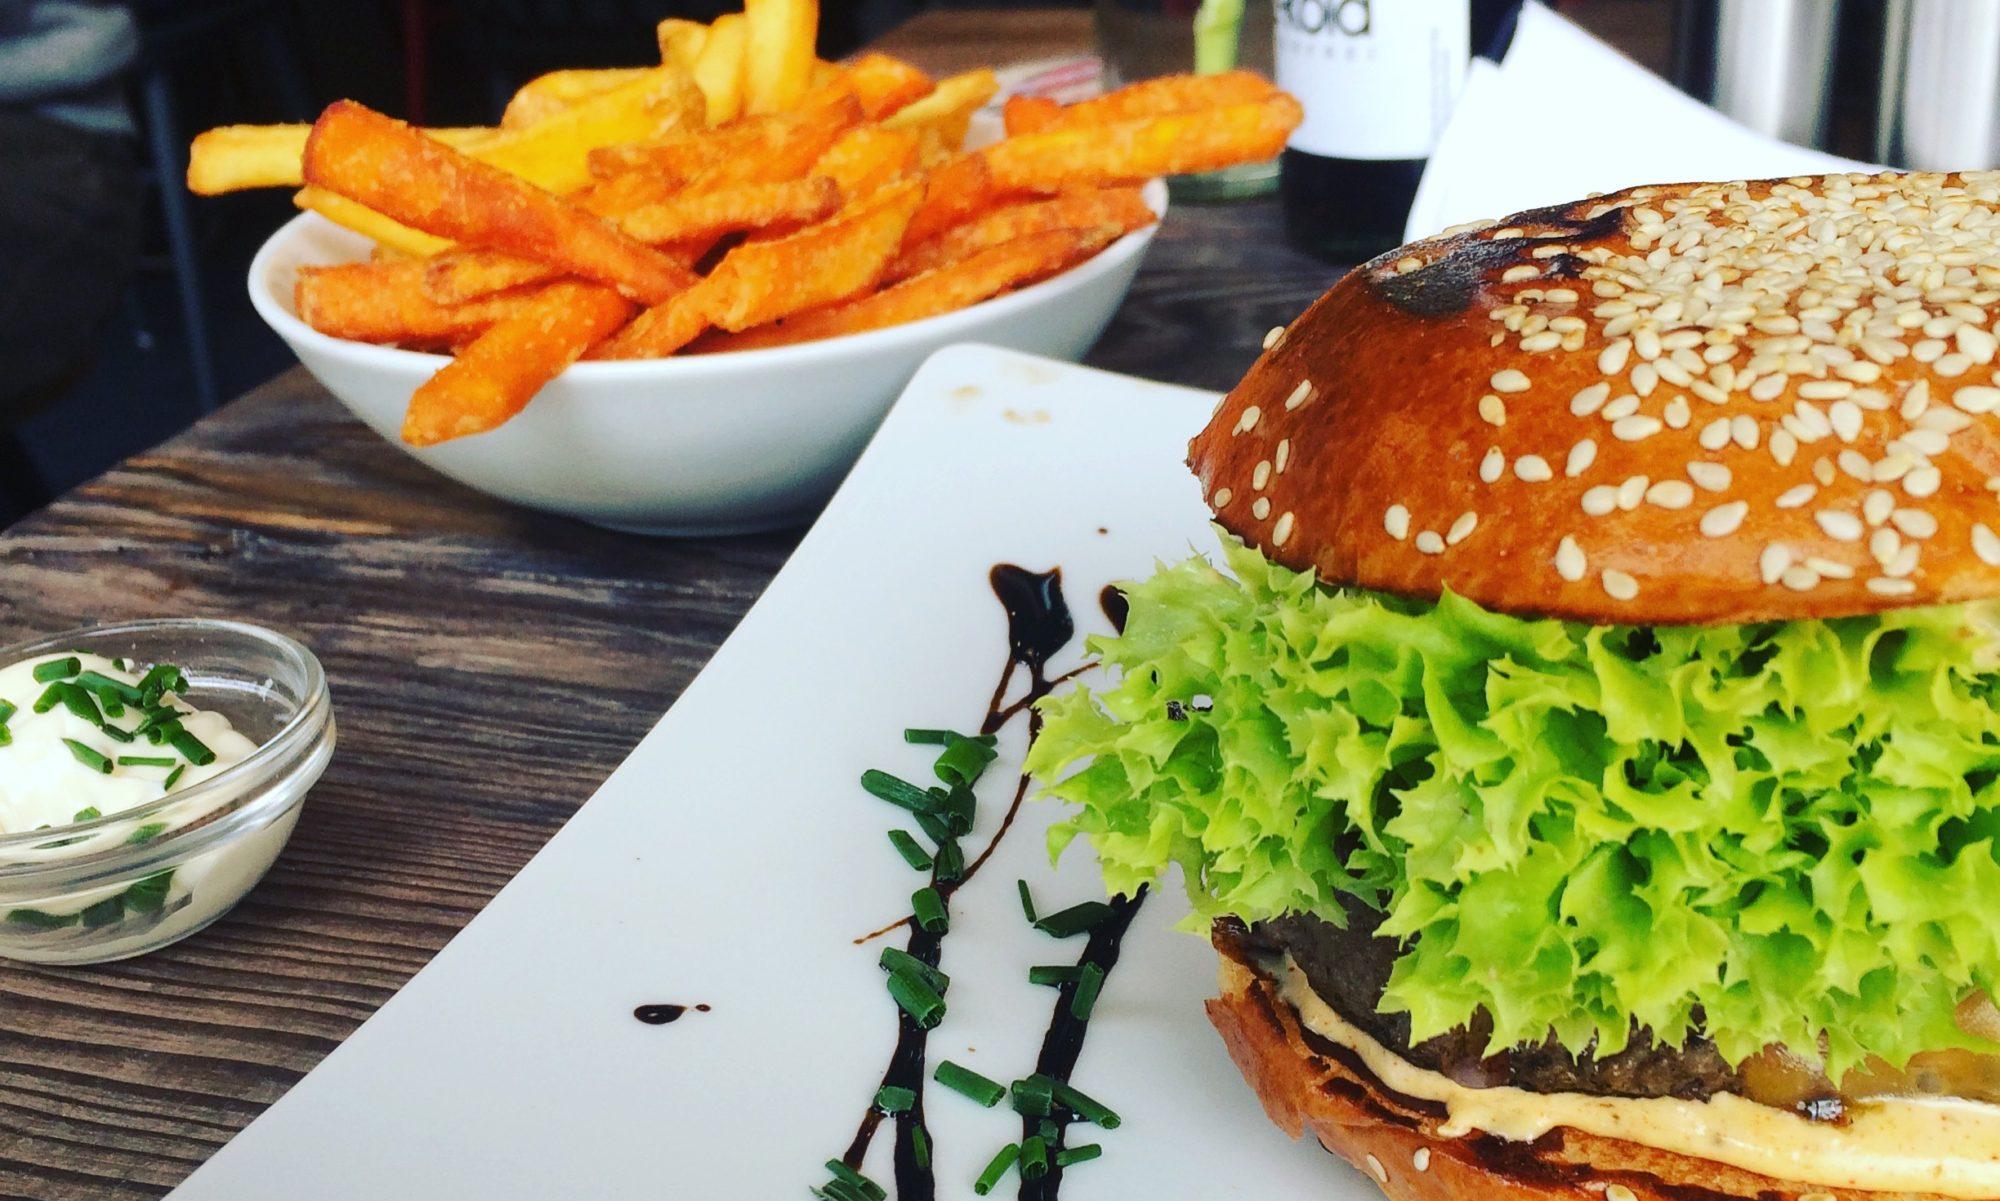 burgermeisterin.com